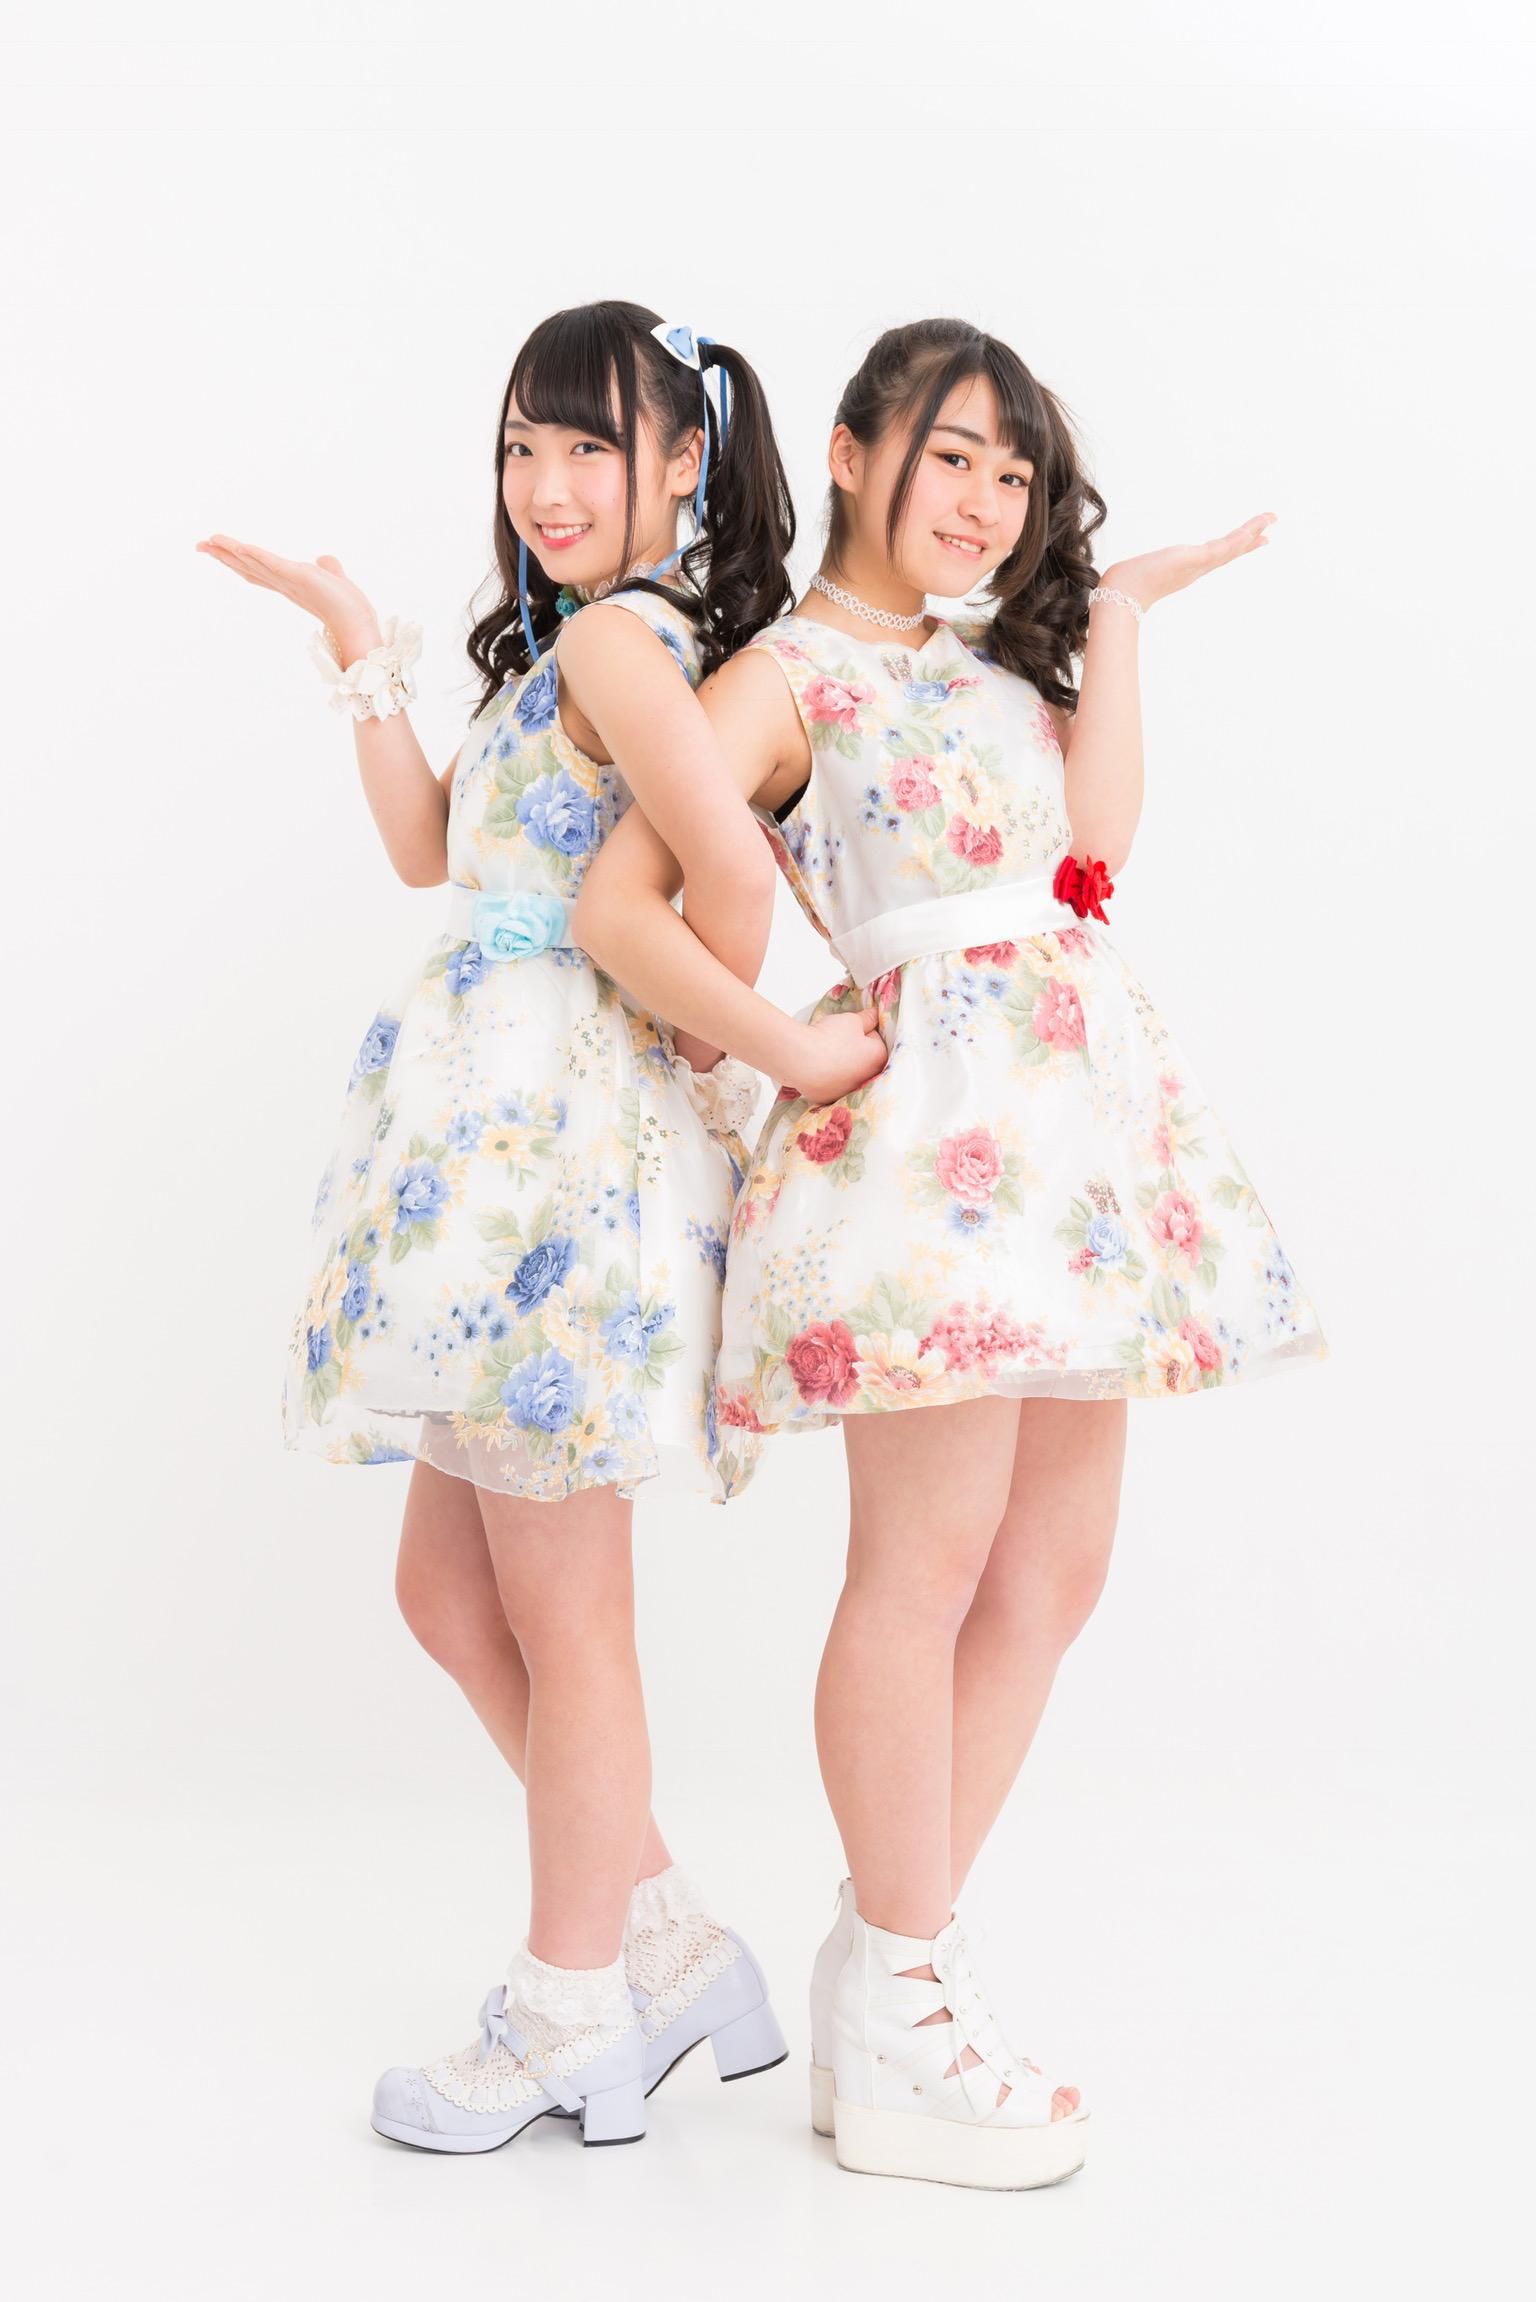 IDOL PARADISE PREMIUM 10 @高松MONSTER